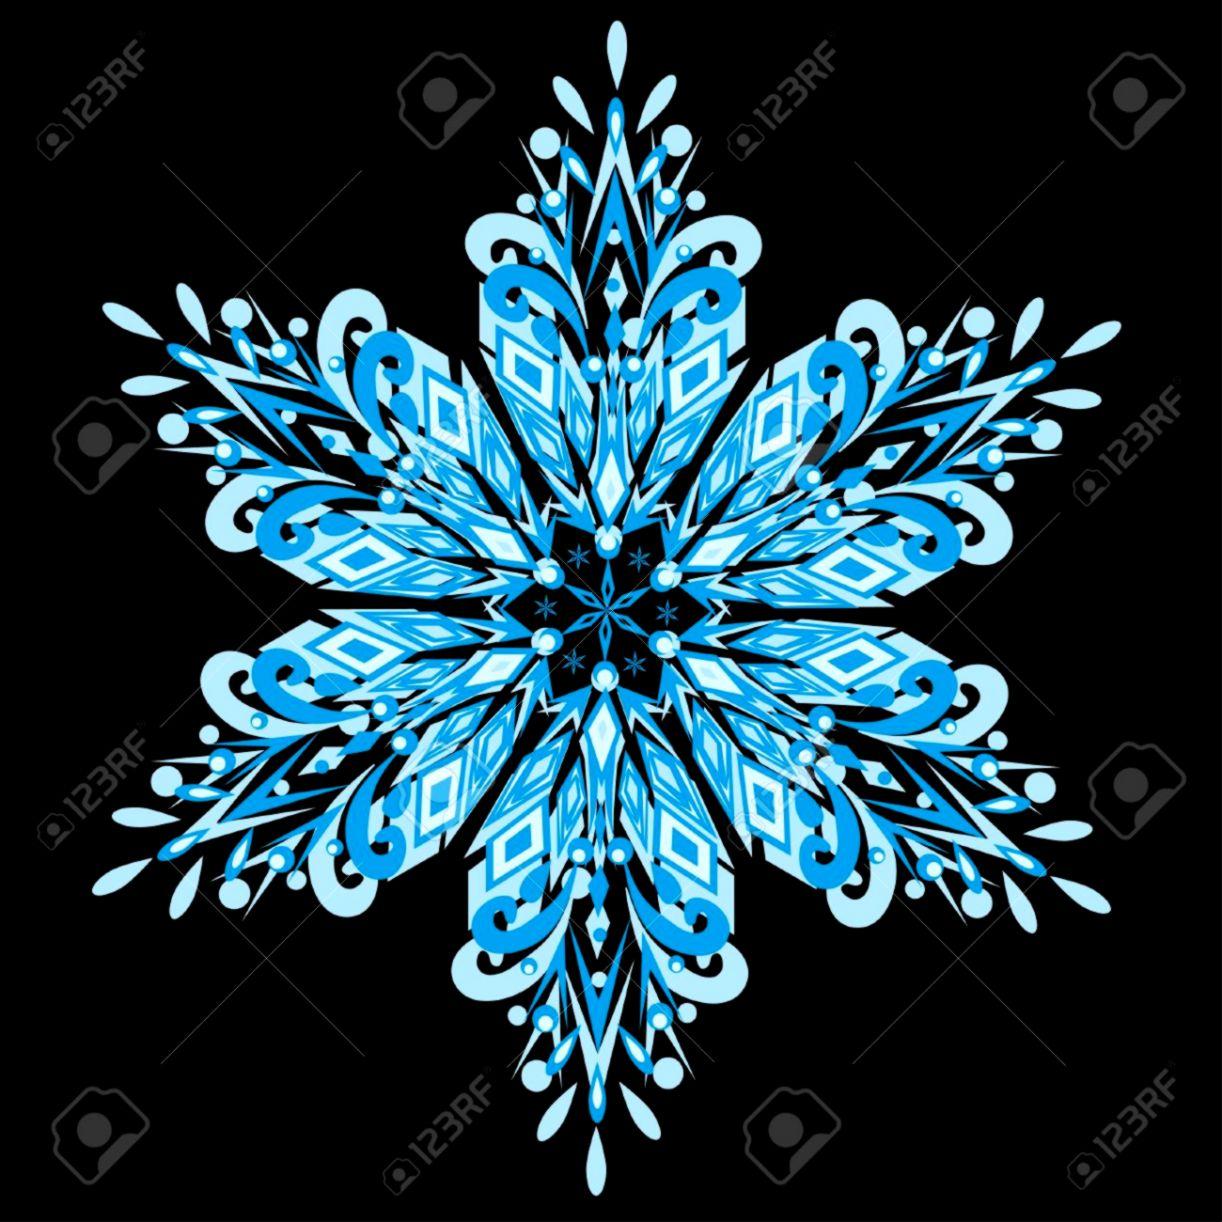 Black Snowflake wallpaper – wallpaper free download